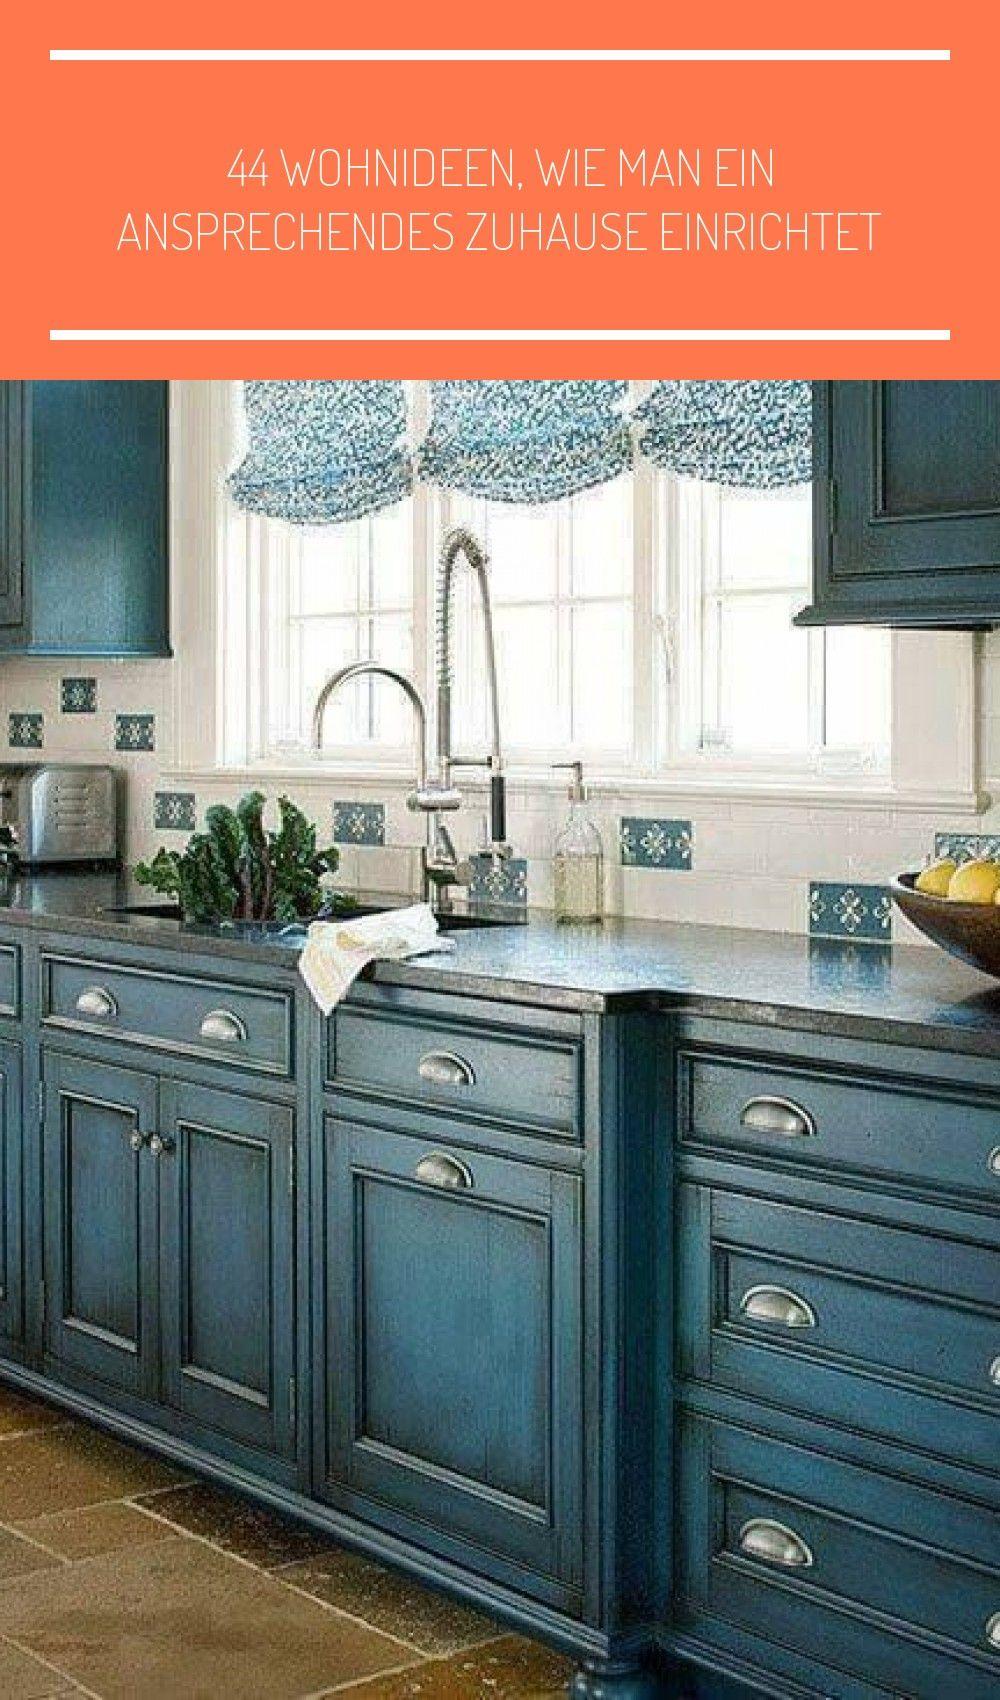 Beautiful Kitchen Blue Kitchen Farmhouse Kitchen Farmhouse Decor Farmhouse Sink Co In 2020 Distressed Kitchen Cabinets Kitchen Cabinet Color Schemes Kitchen Style